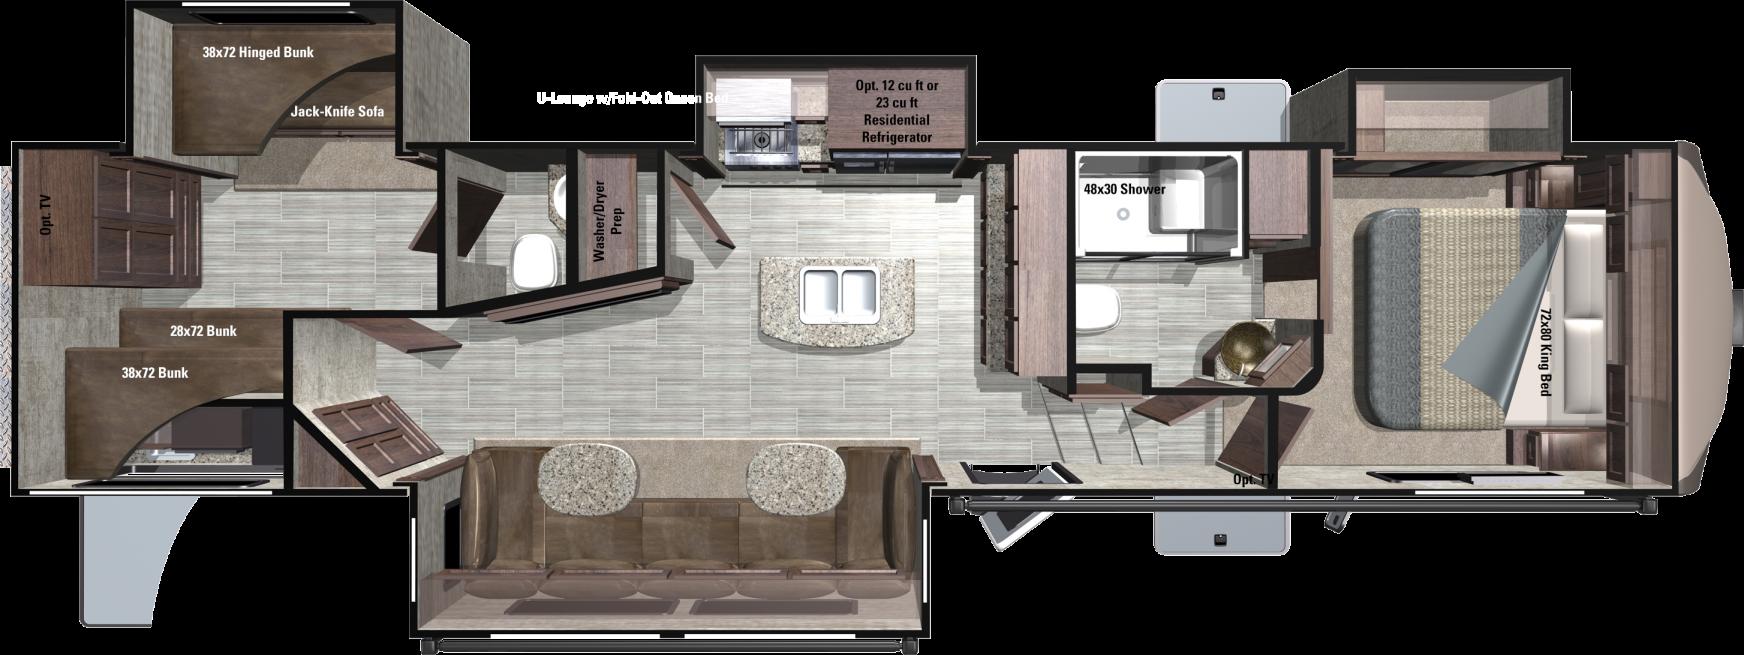 RF374BHS Floorplan